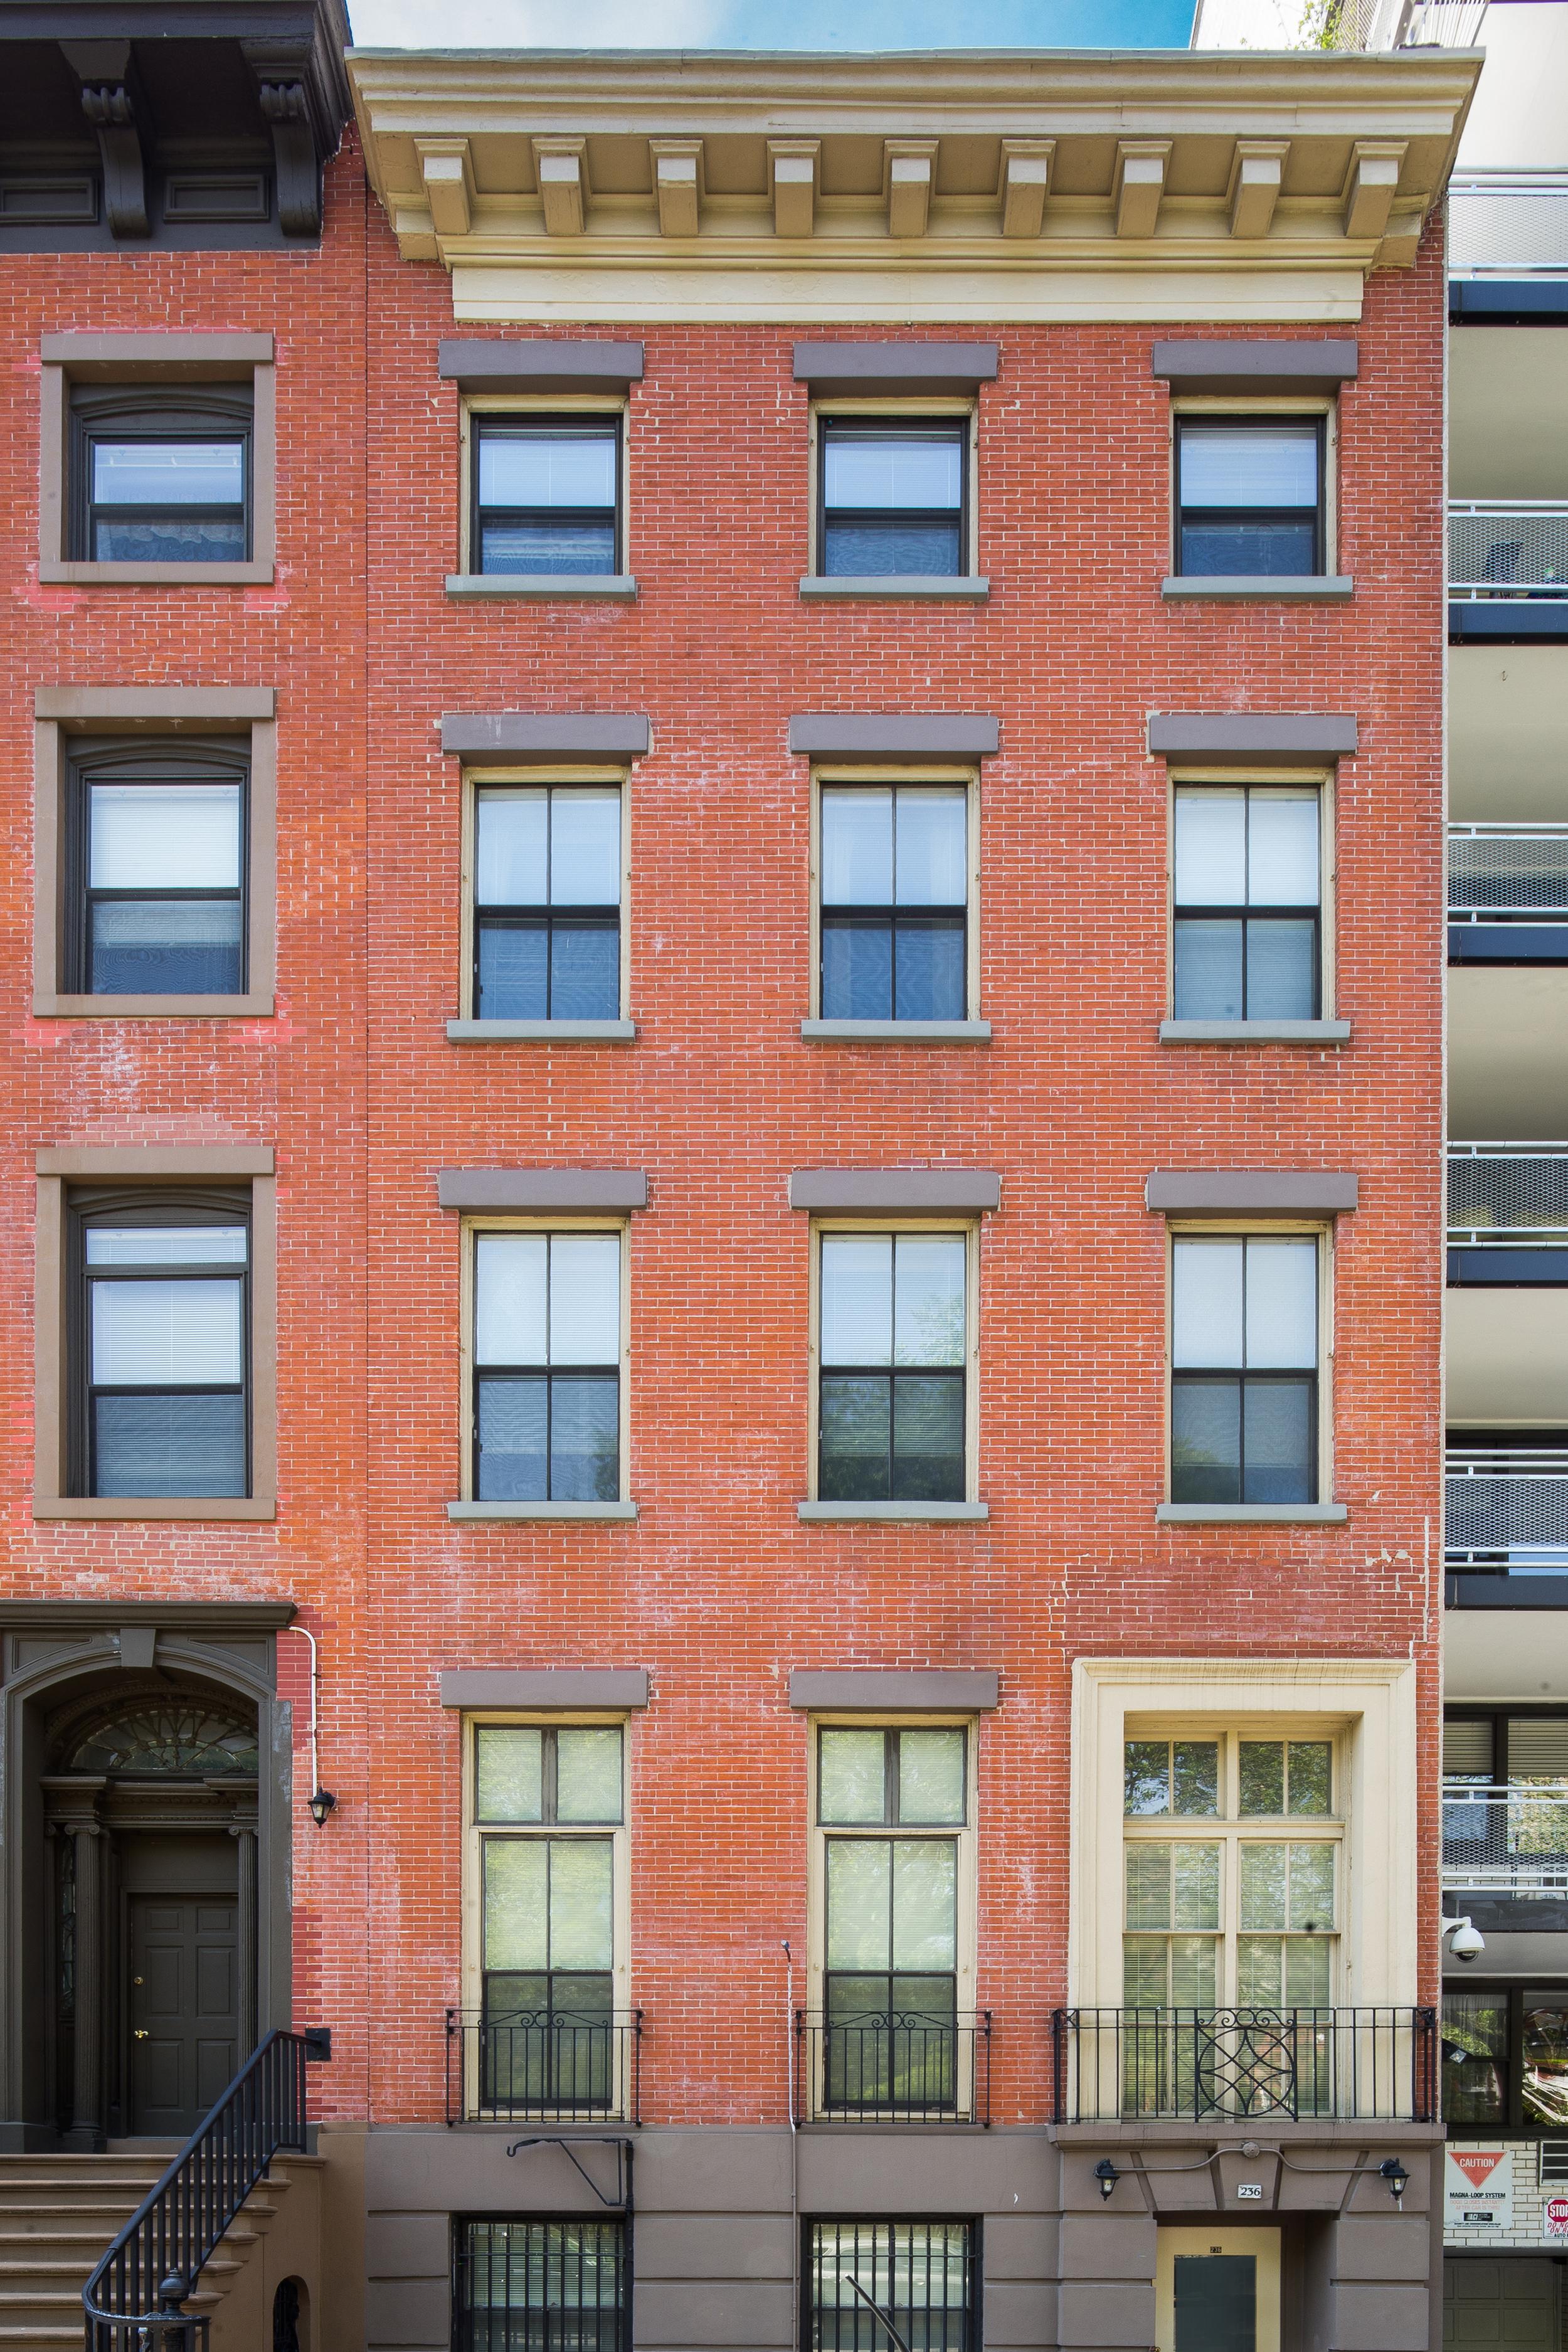 236 East 15th Street - $9,755,000